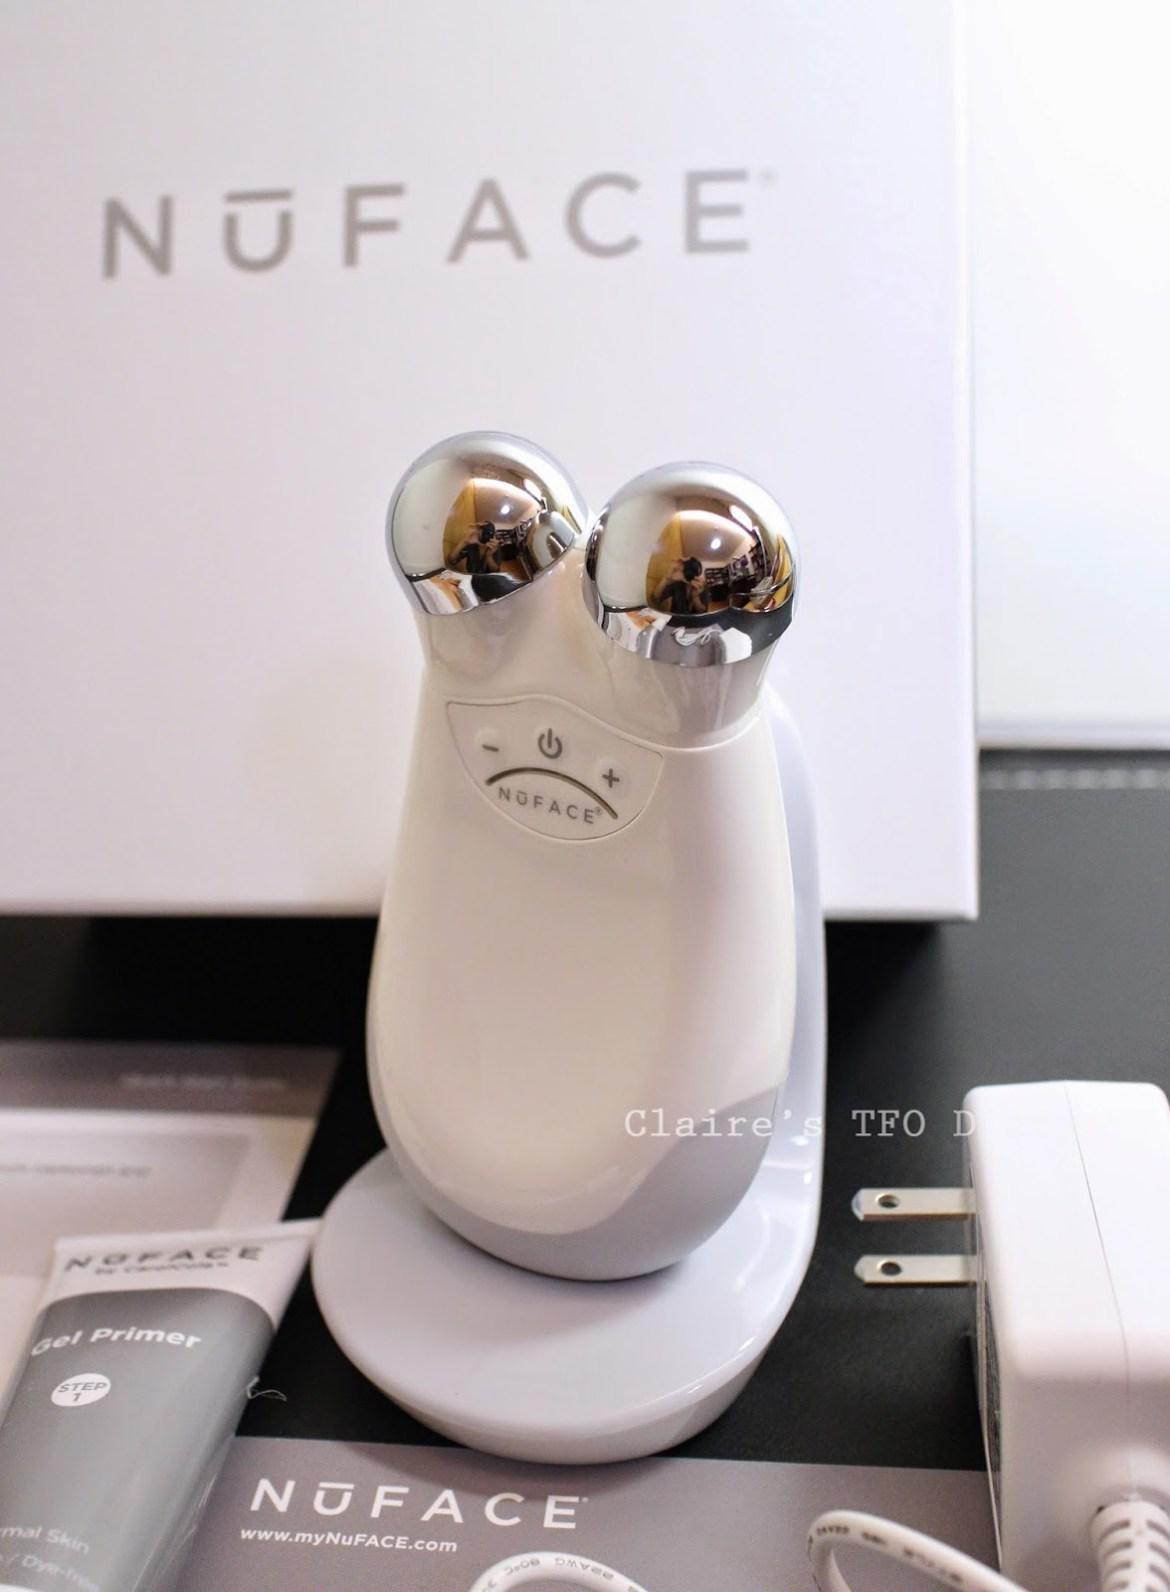 nuface-trinity-unboxing-04.jpg